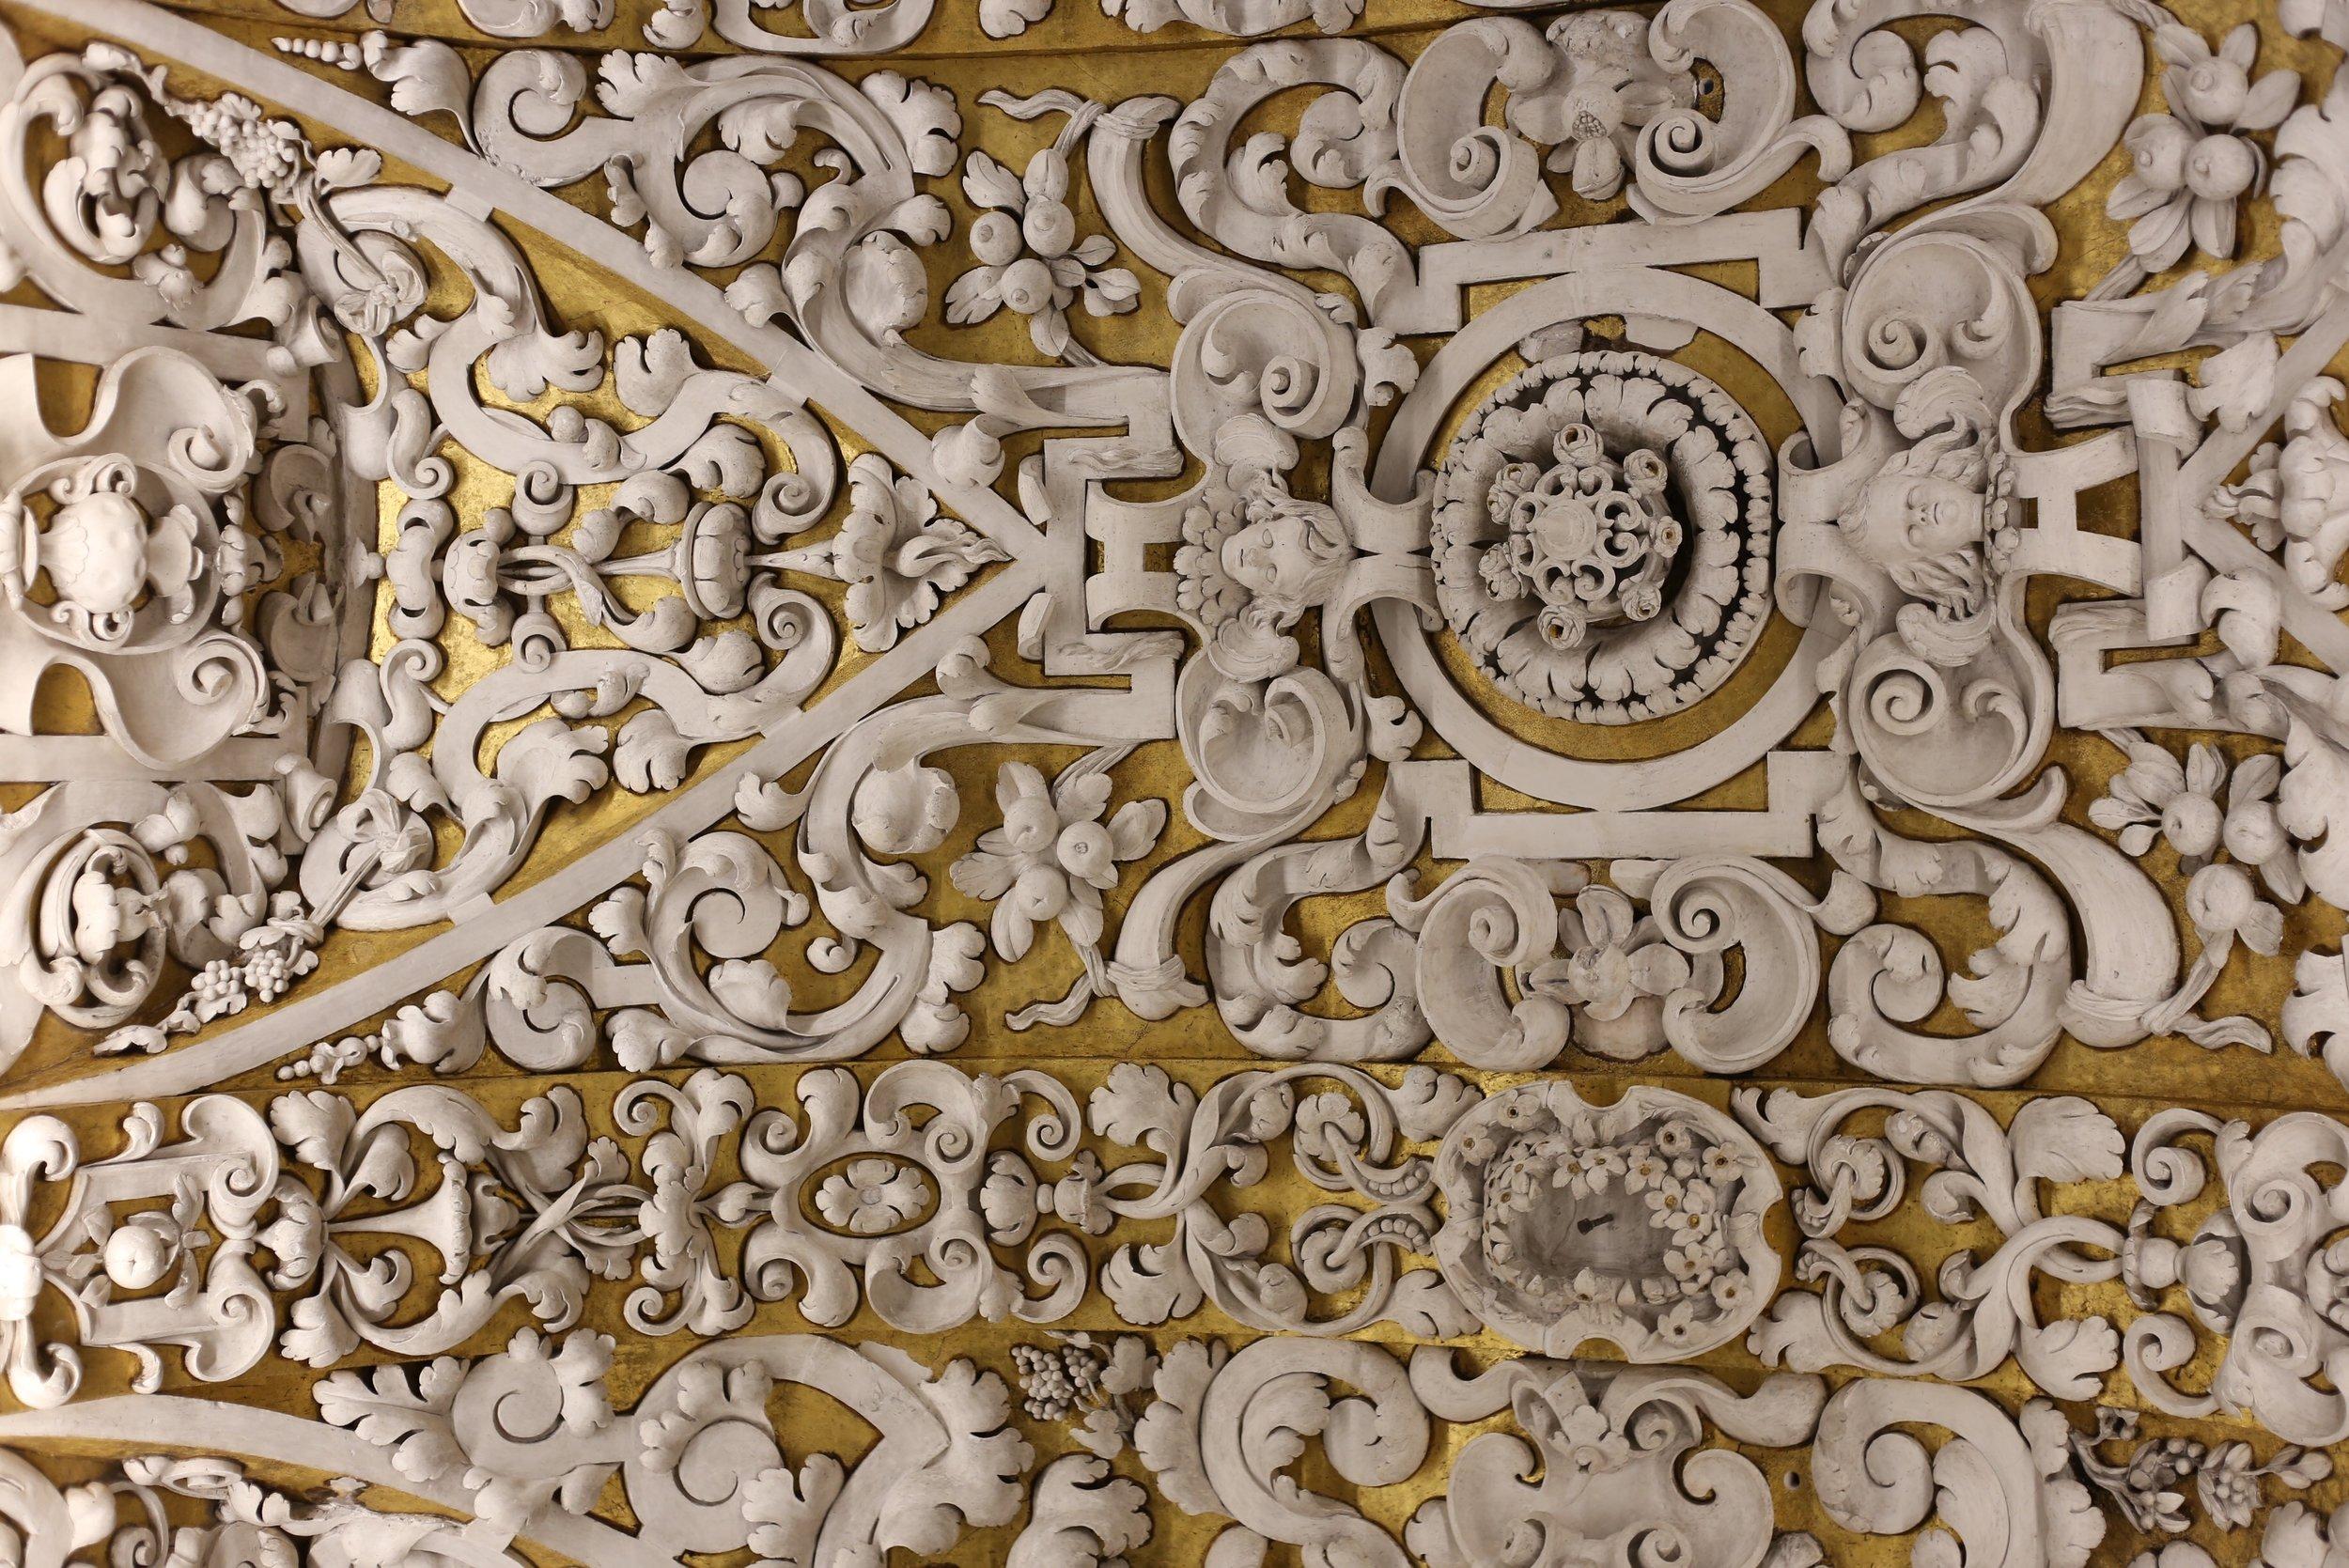 Spanish church plaster ceiling